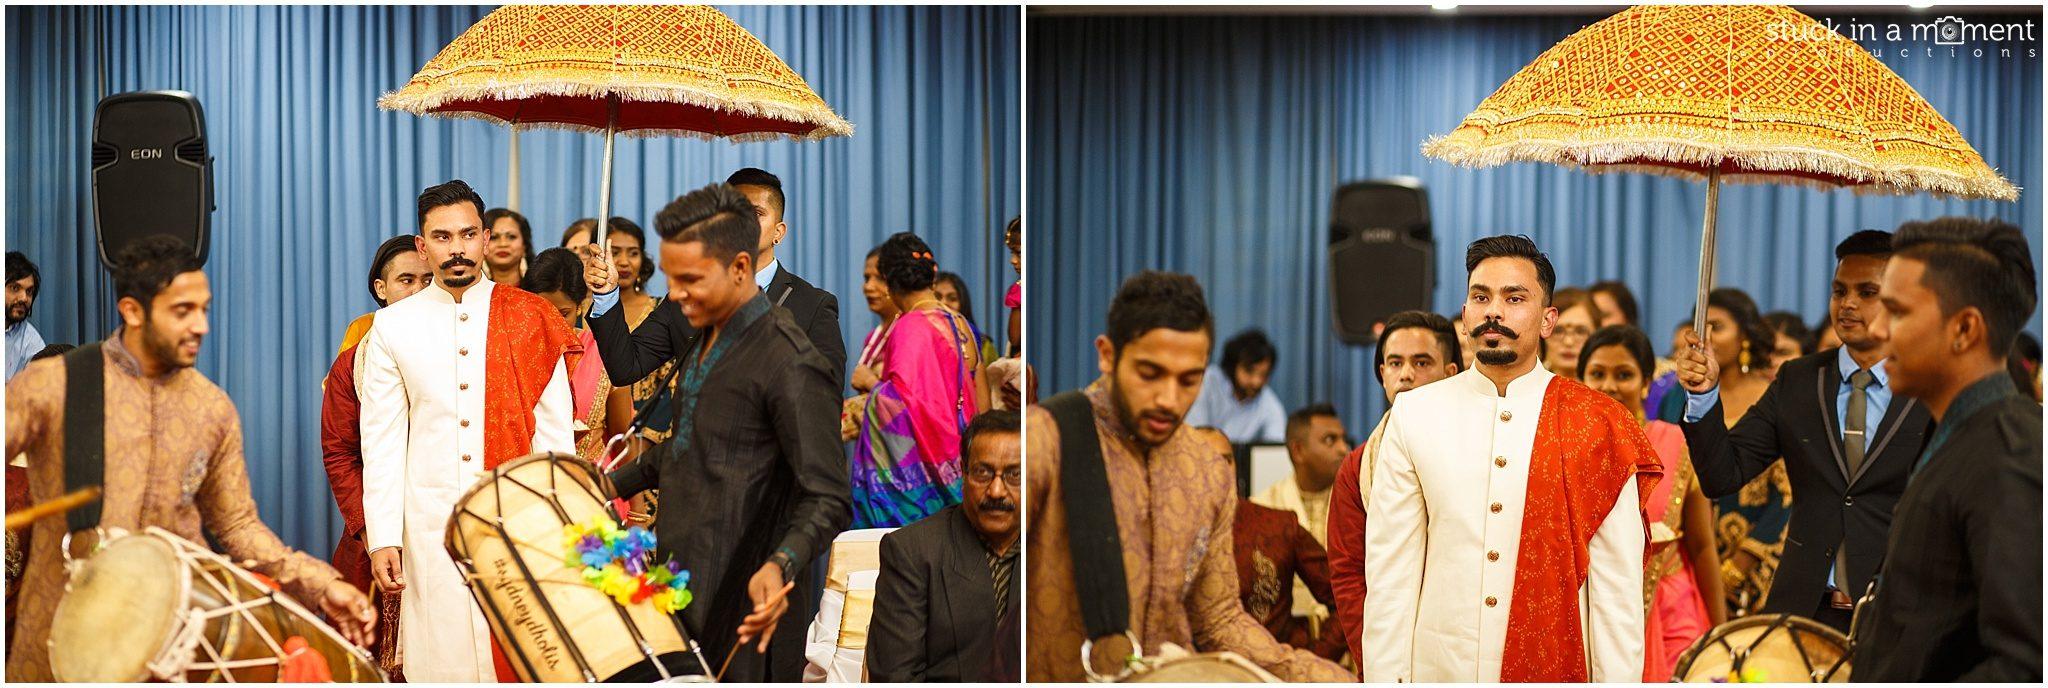 indian wedding reception macquarie paradiso